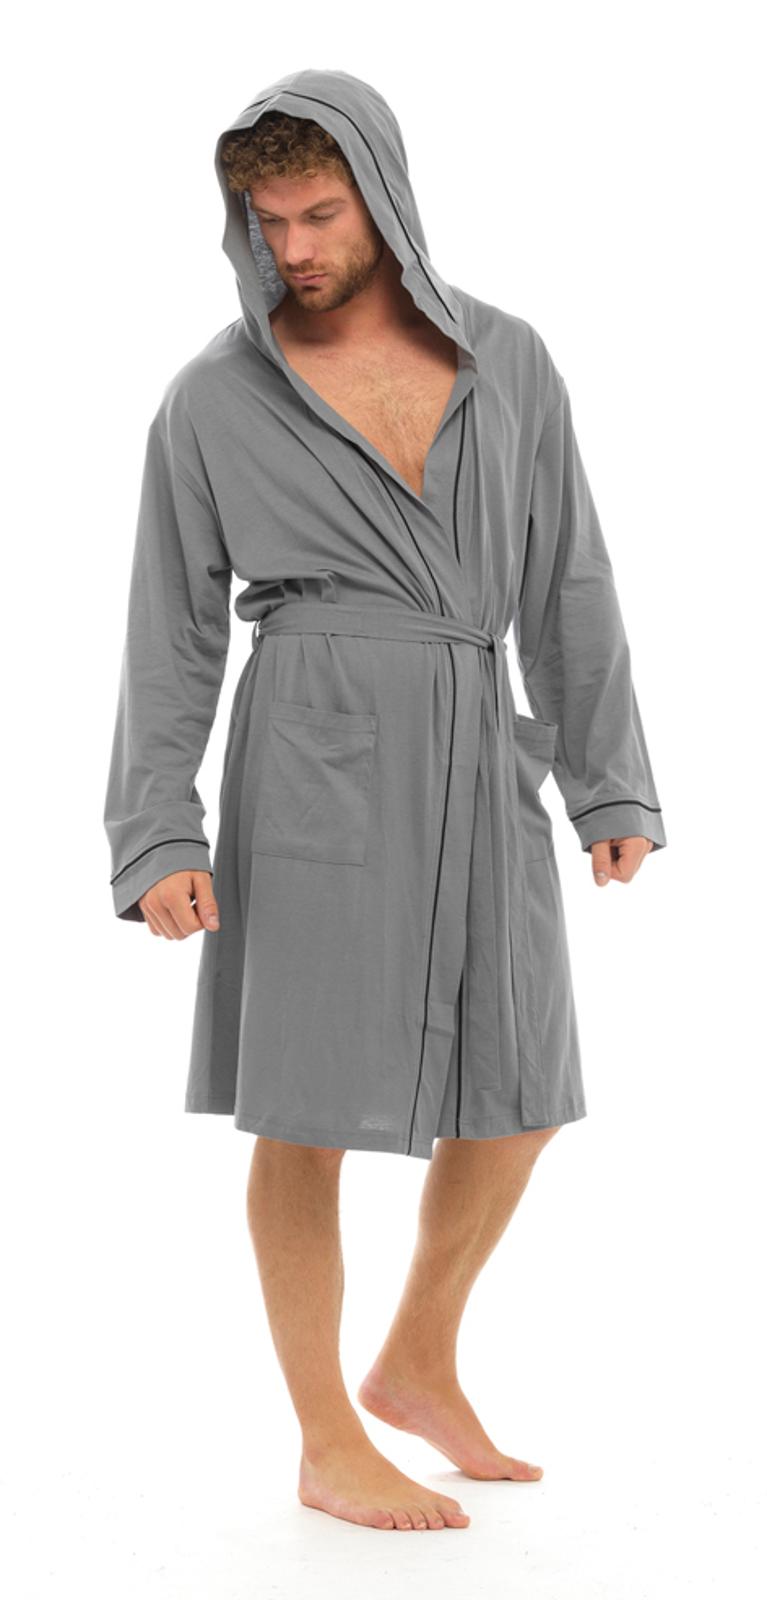 mens lightweight hooded robe summer dressing gown 100 cotton bathrobe size. Black Bedroom Furniture Sets. Home Design Ideas